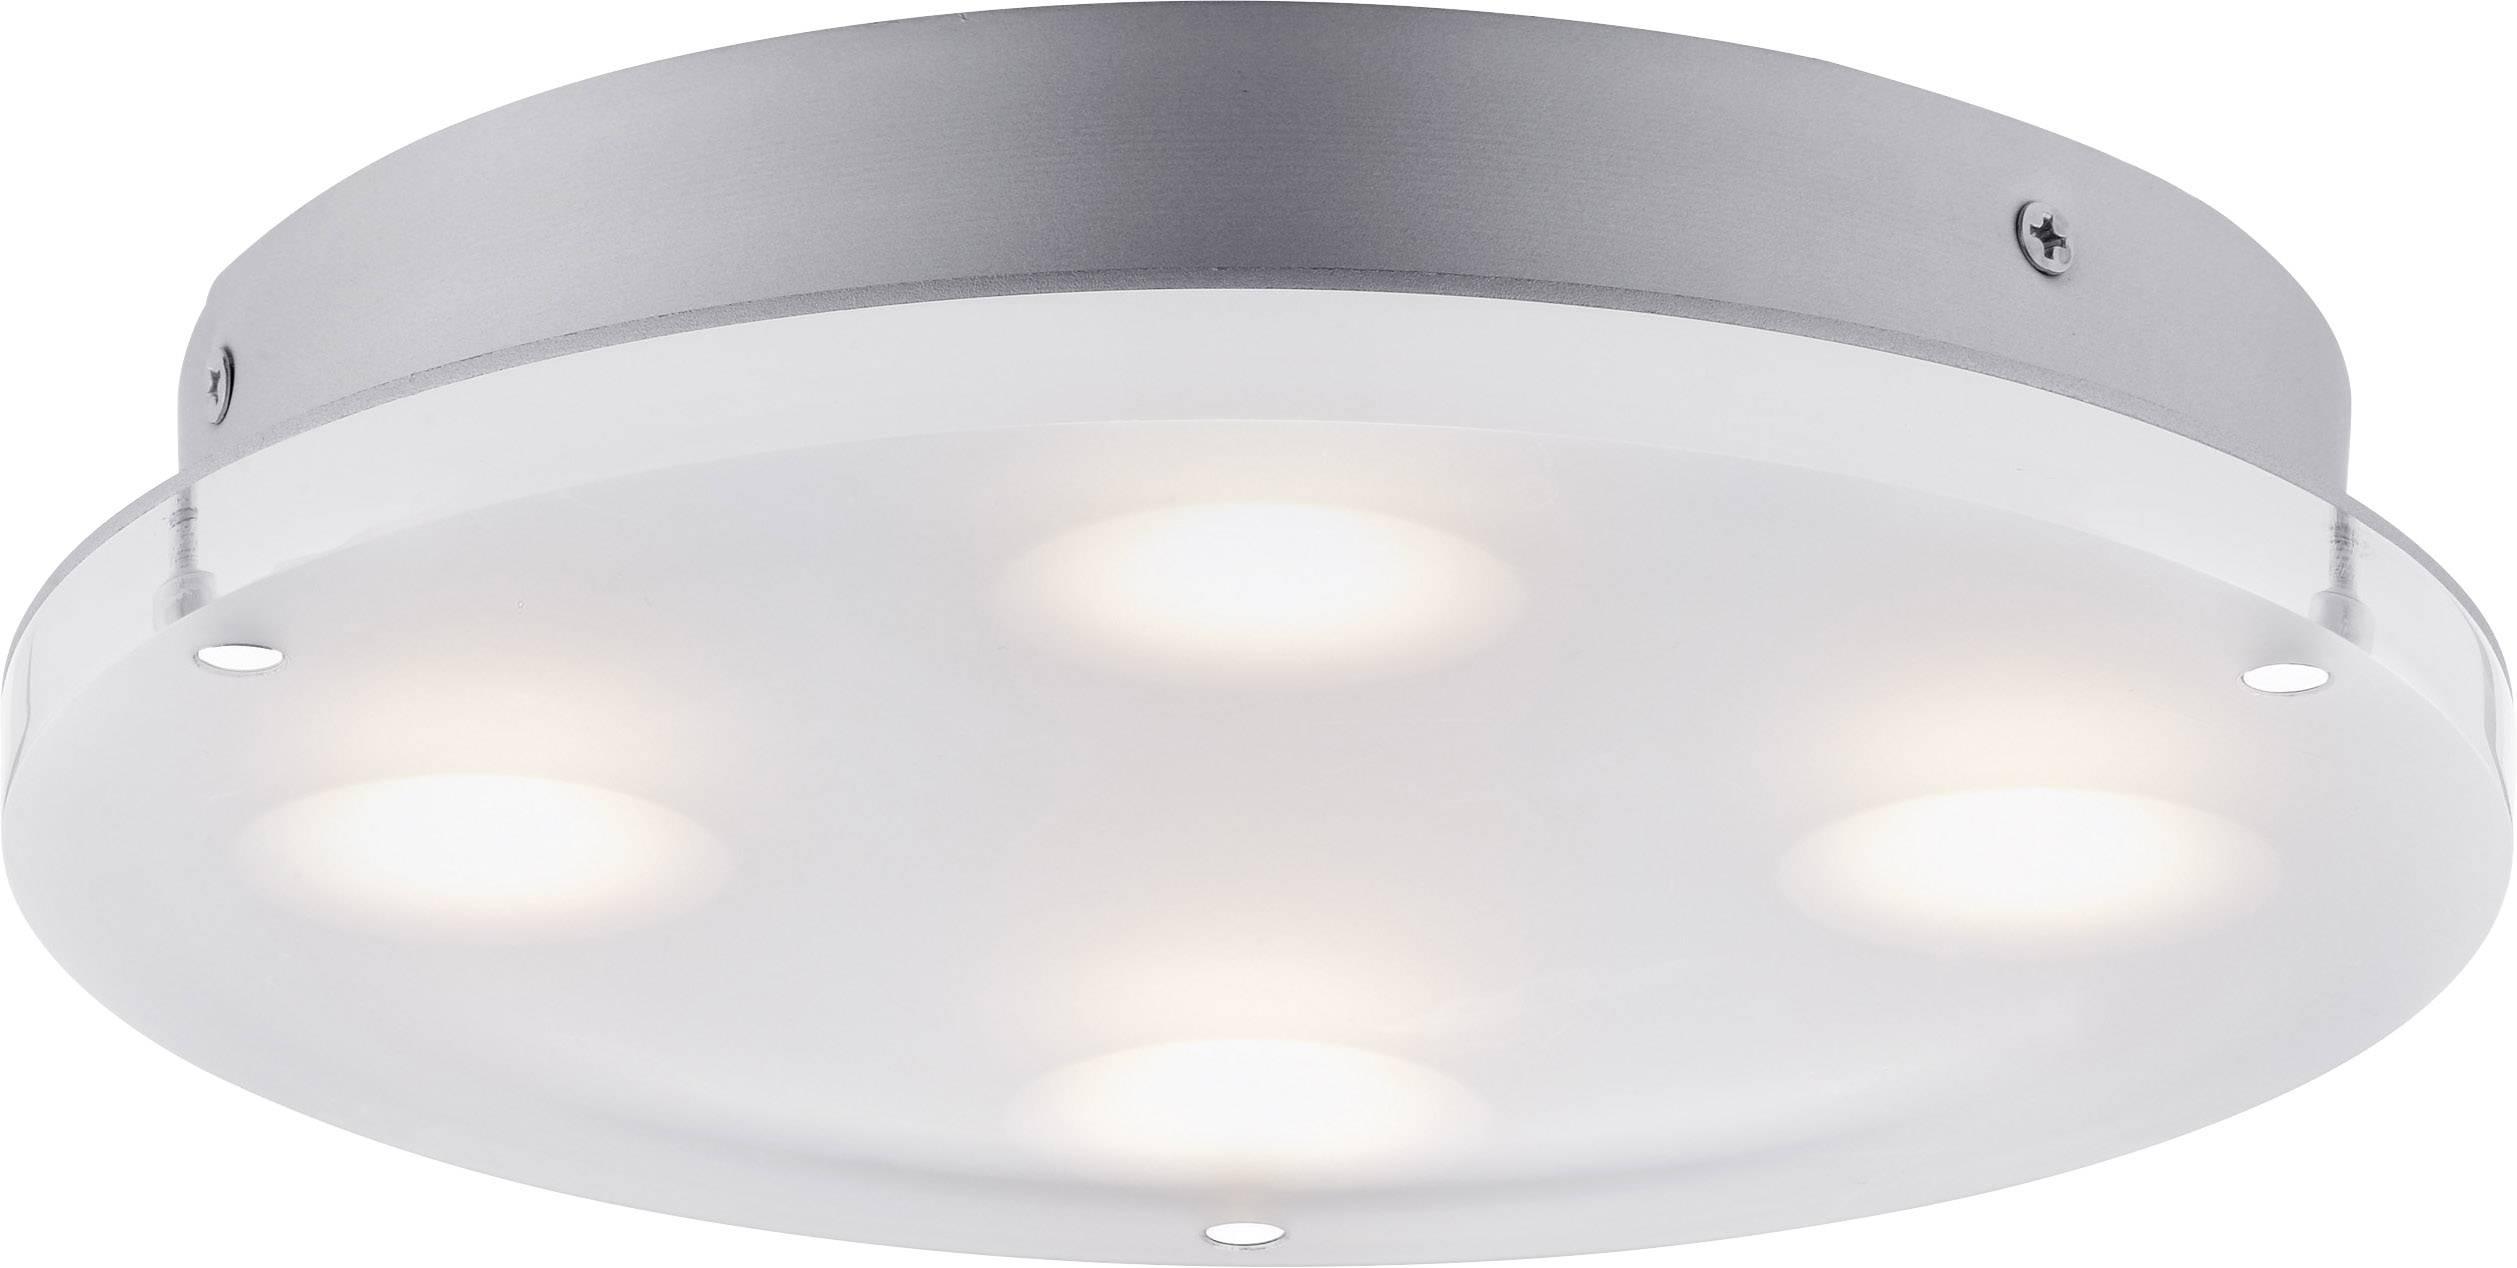 Led plafondlamp voor badkamer 18 w paulmann 70509 minor satijn